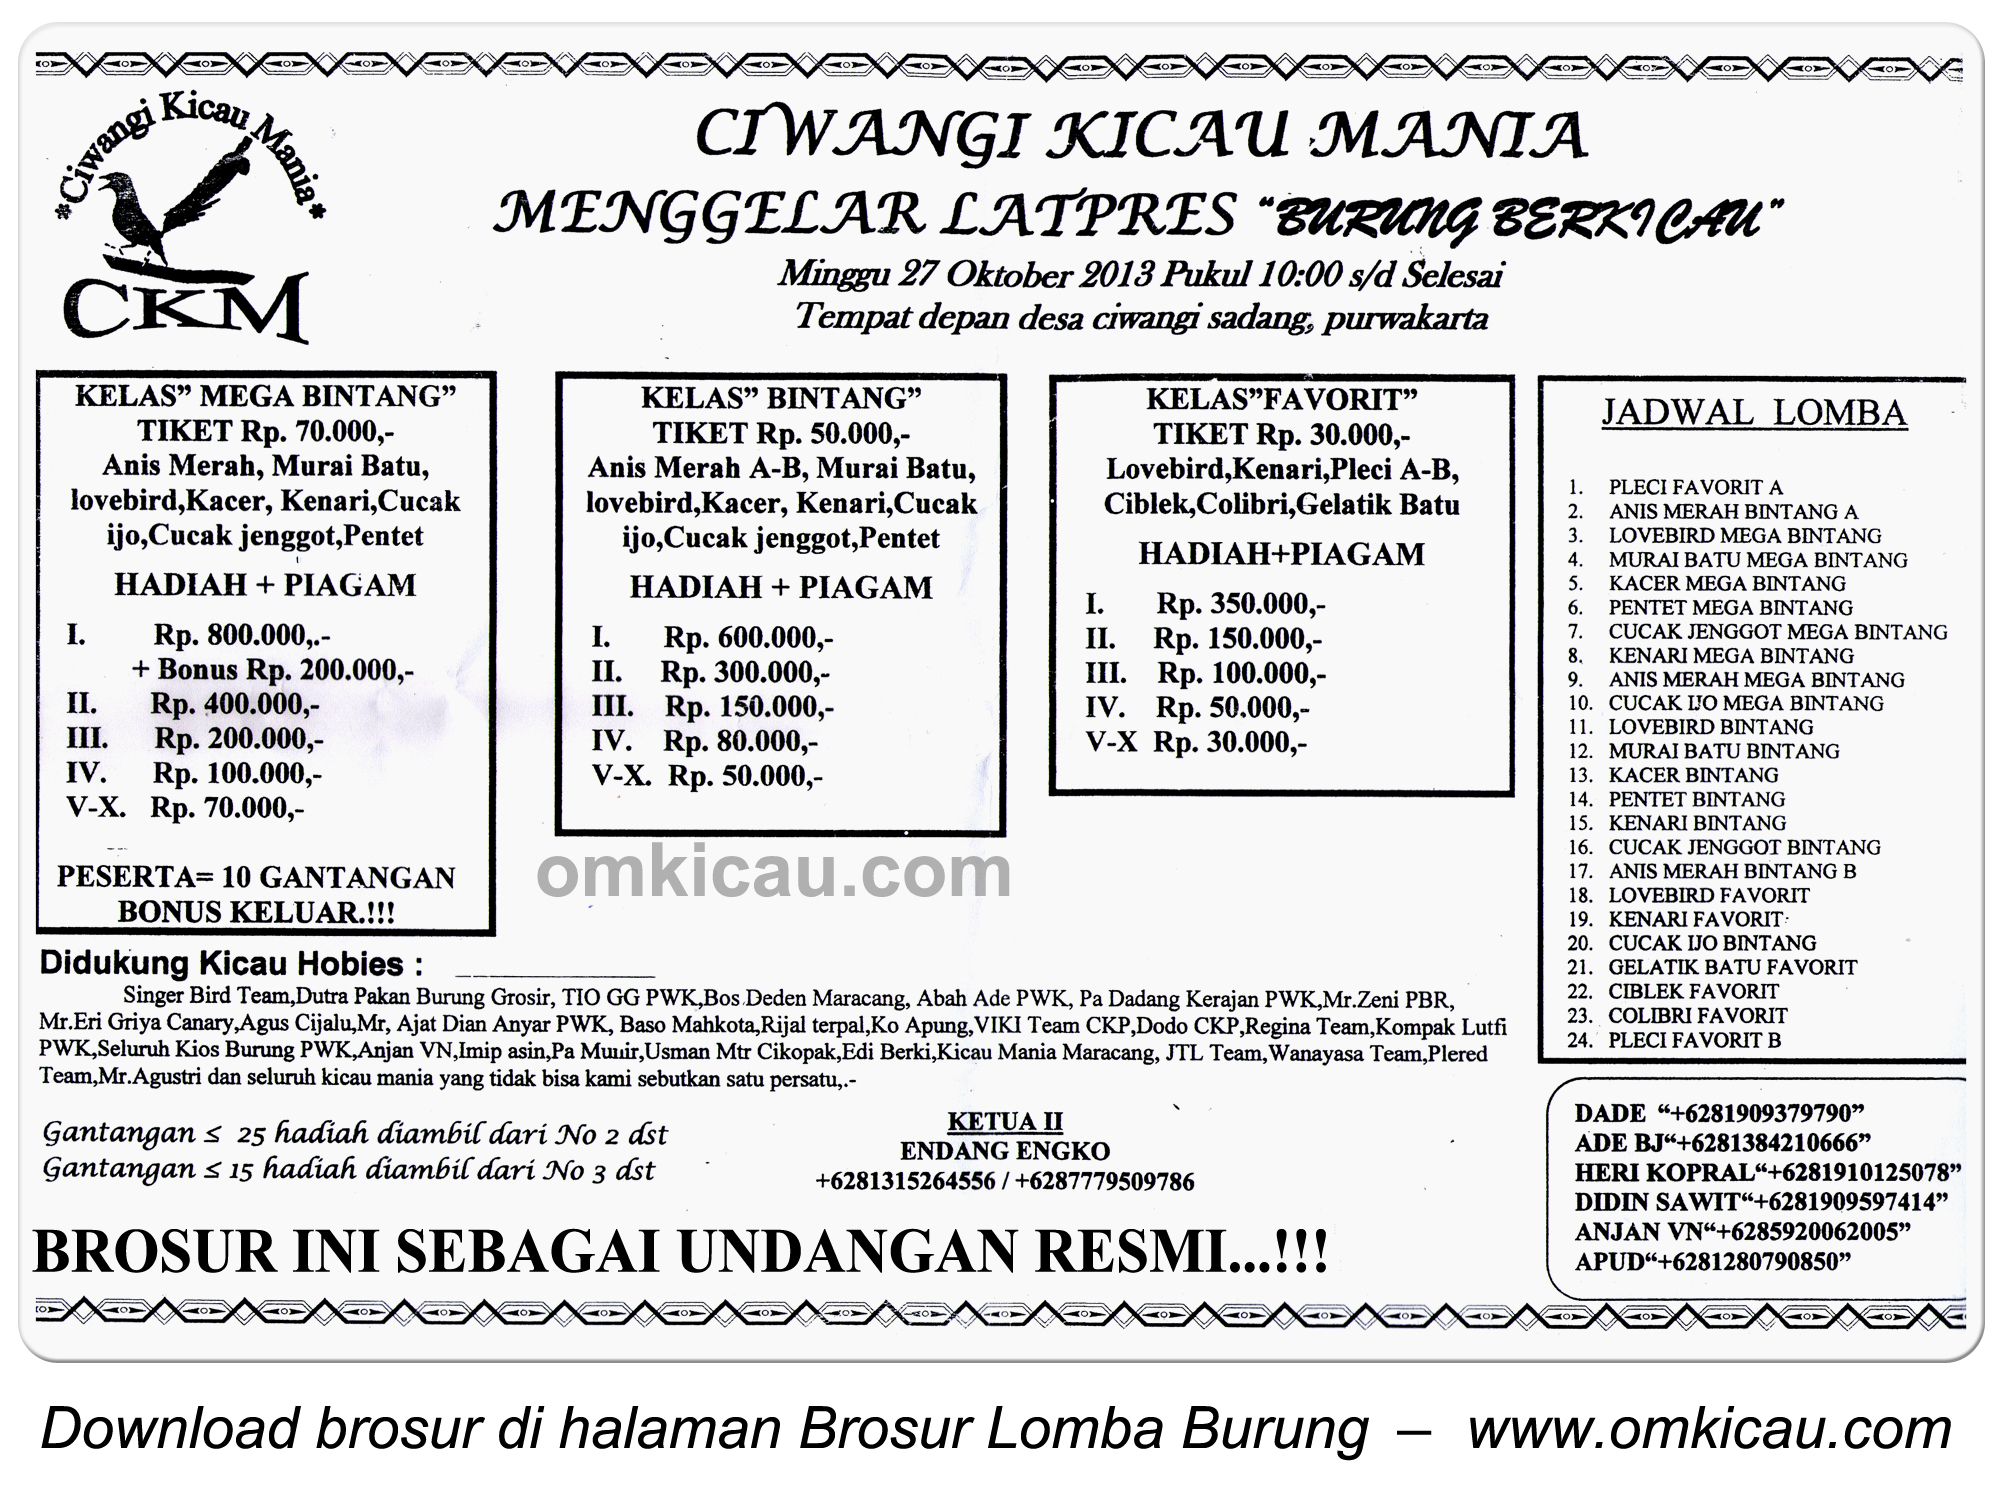 Brosur Latpres Burung Berkicau Ciwangi KM, Purwakarta, 27 Oktober 2013